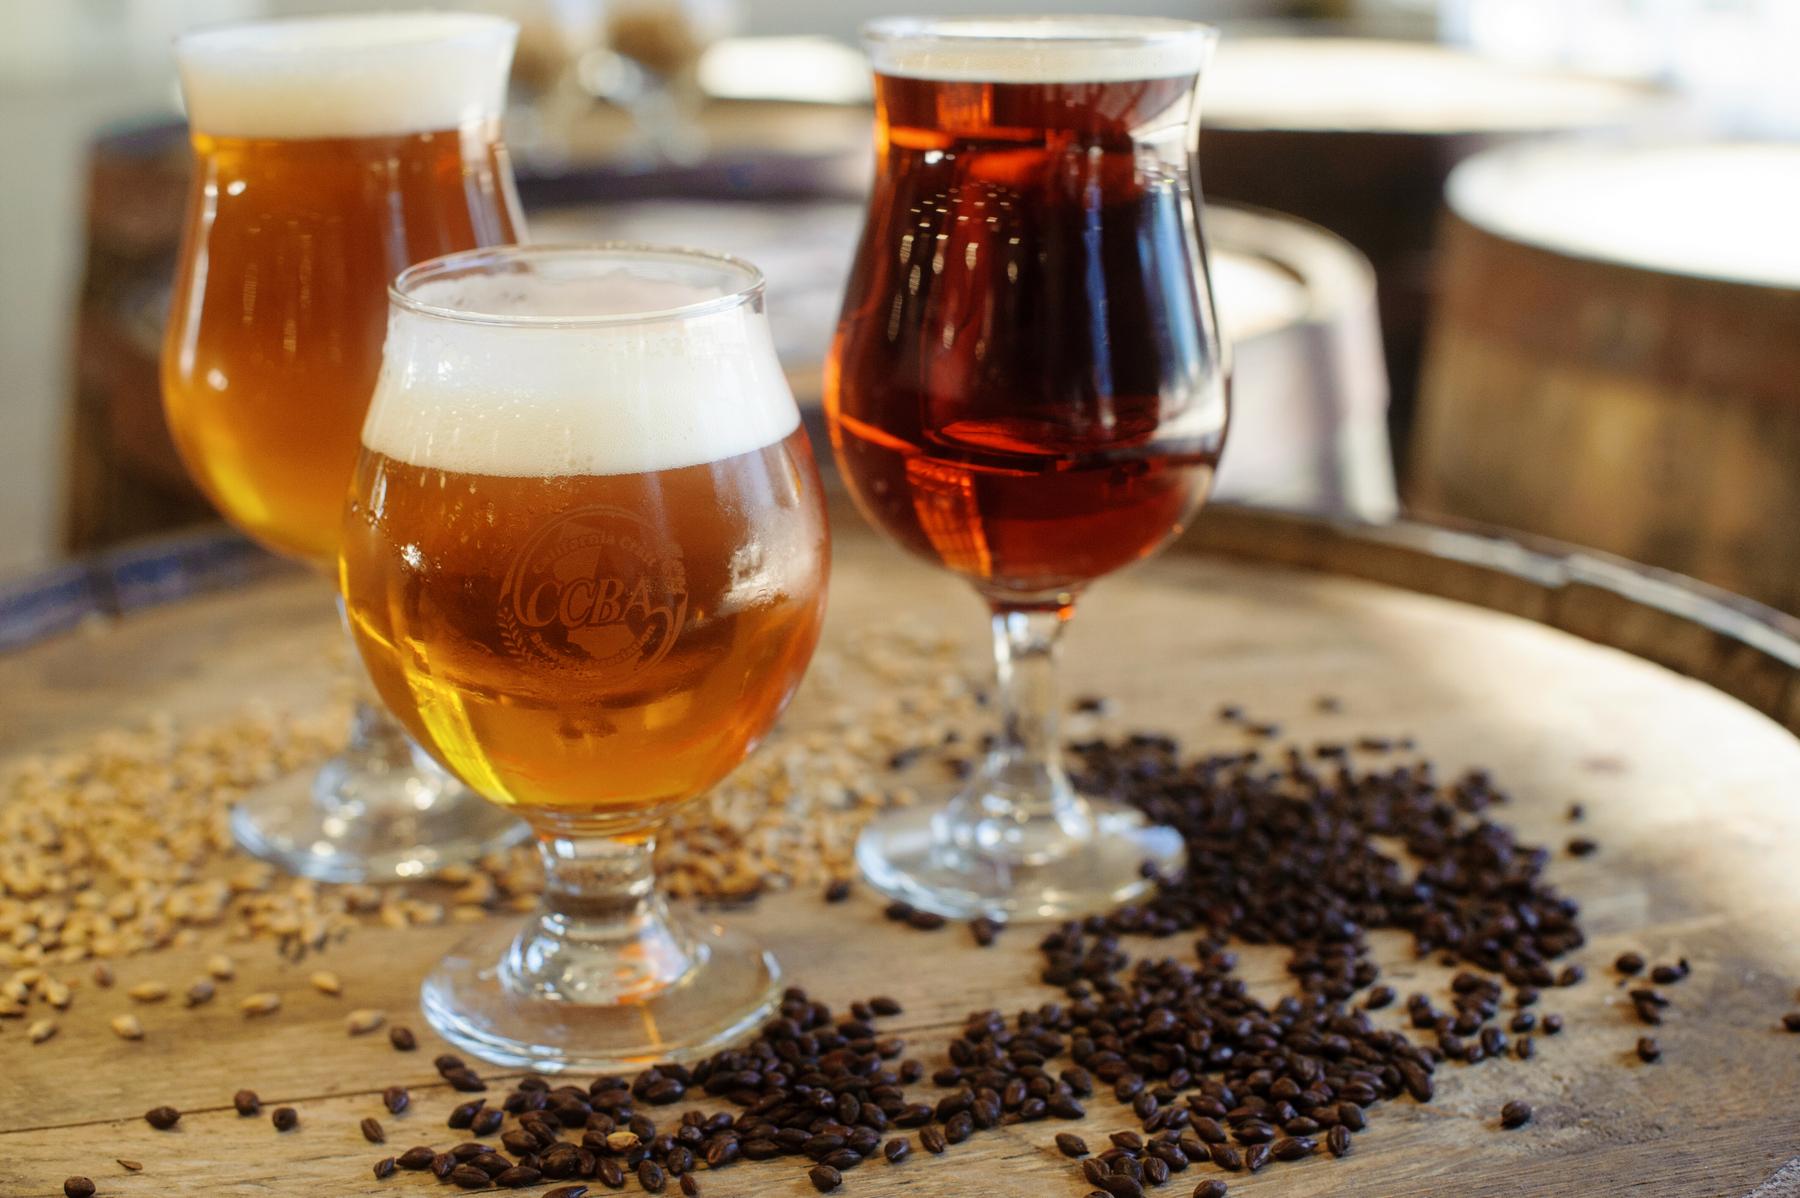 image of 3 beers on barrel